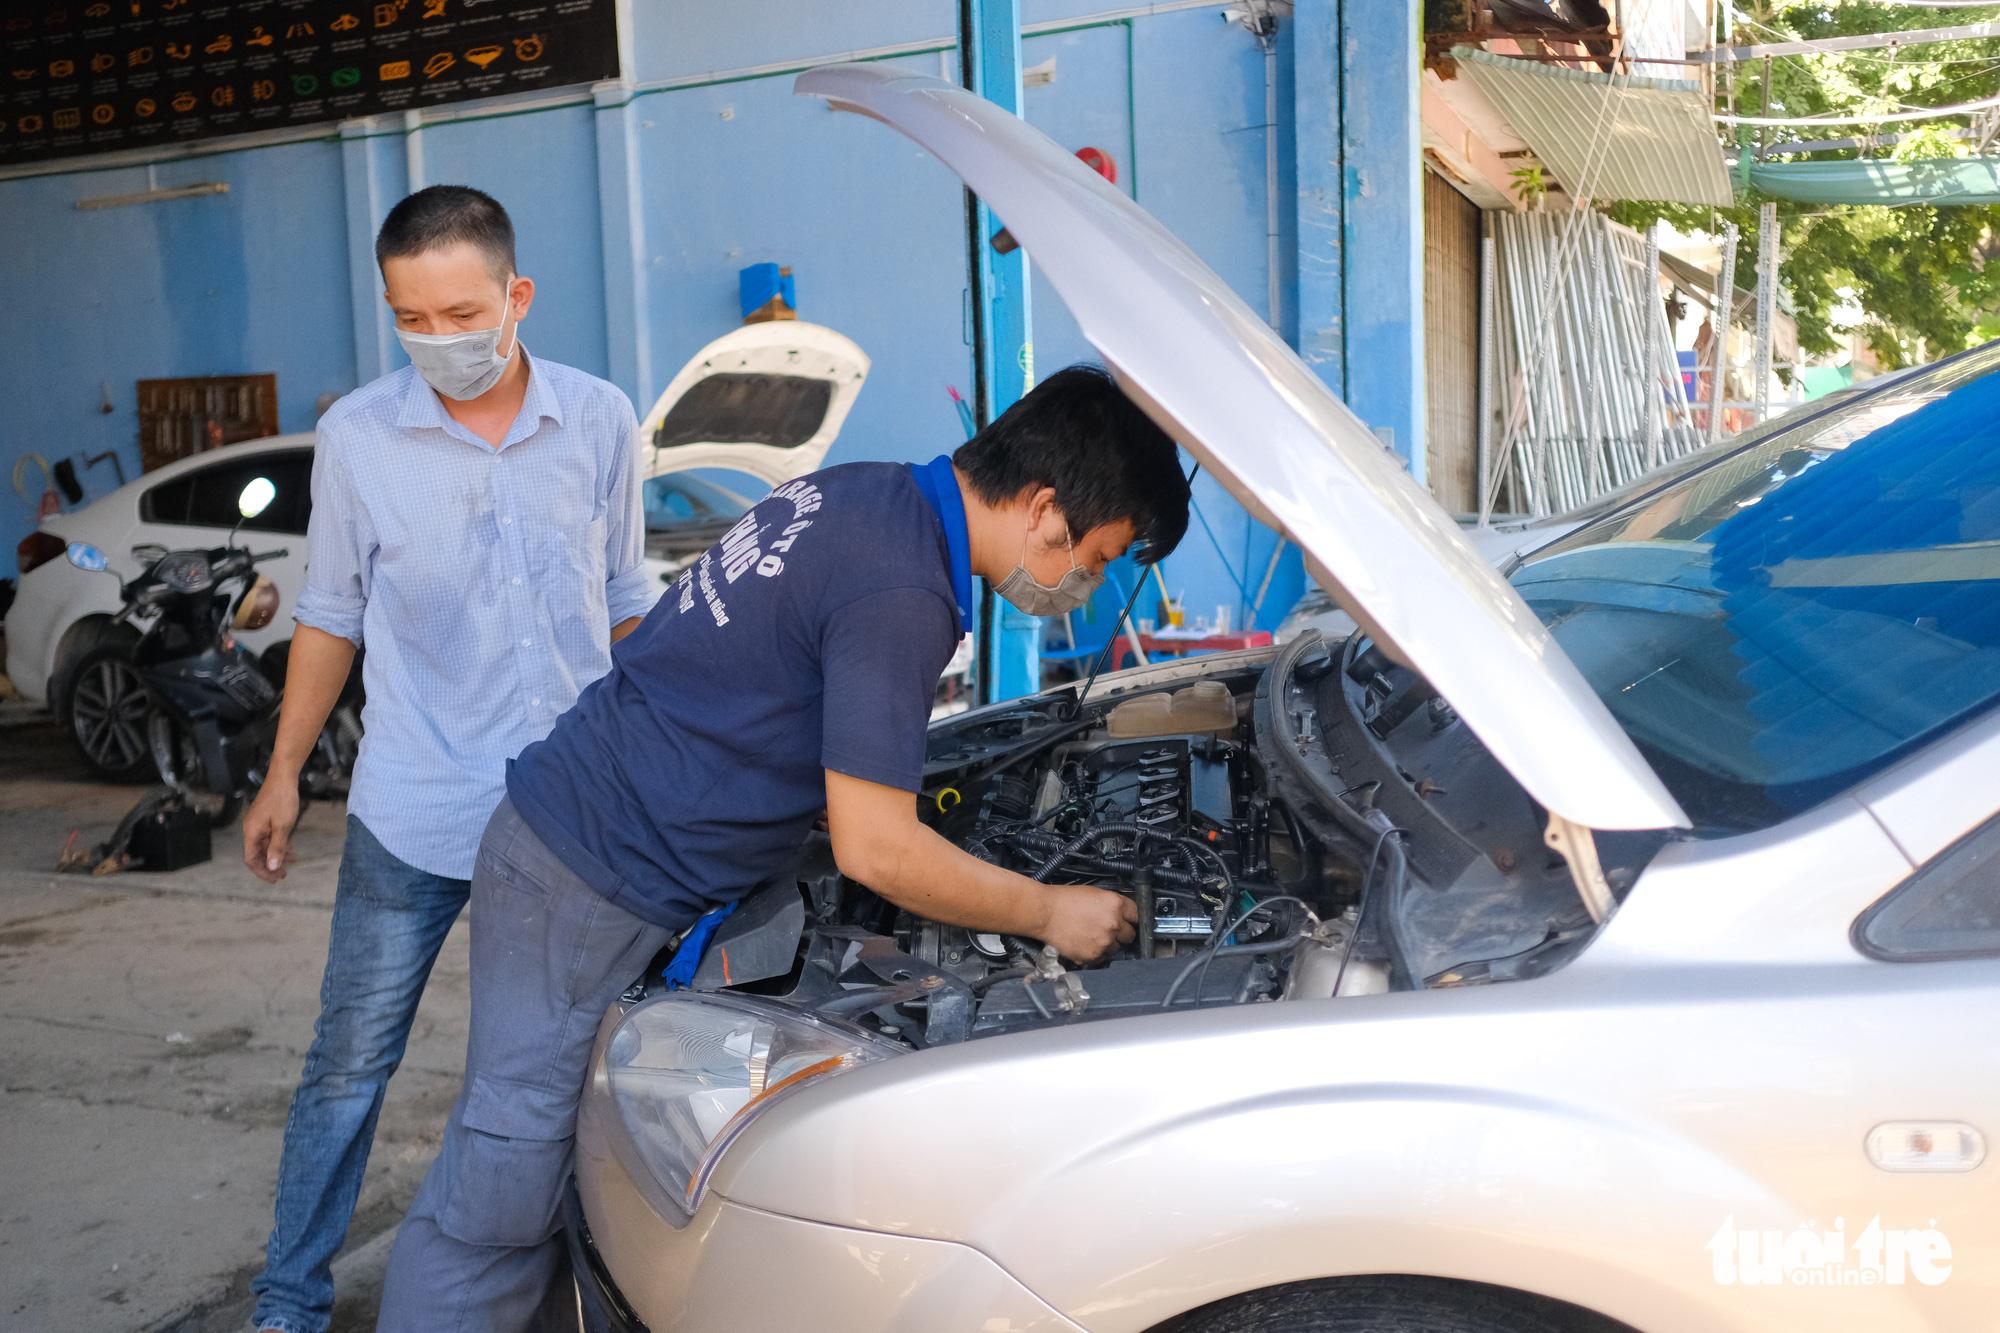 Workers repair a car at a garage in Lien Chieu District, Da Nang, September 16, 2021. Photo: Tan Luc / Tuoi Tre